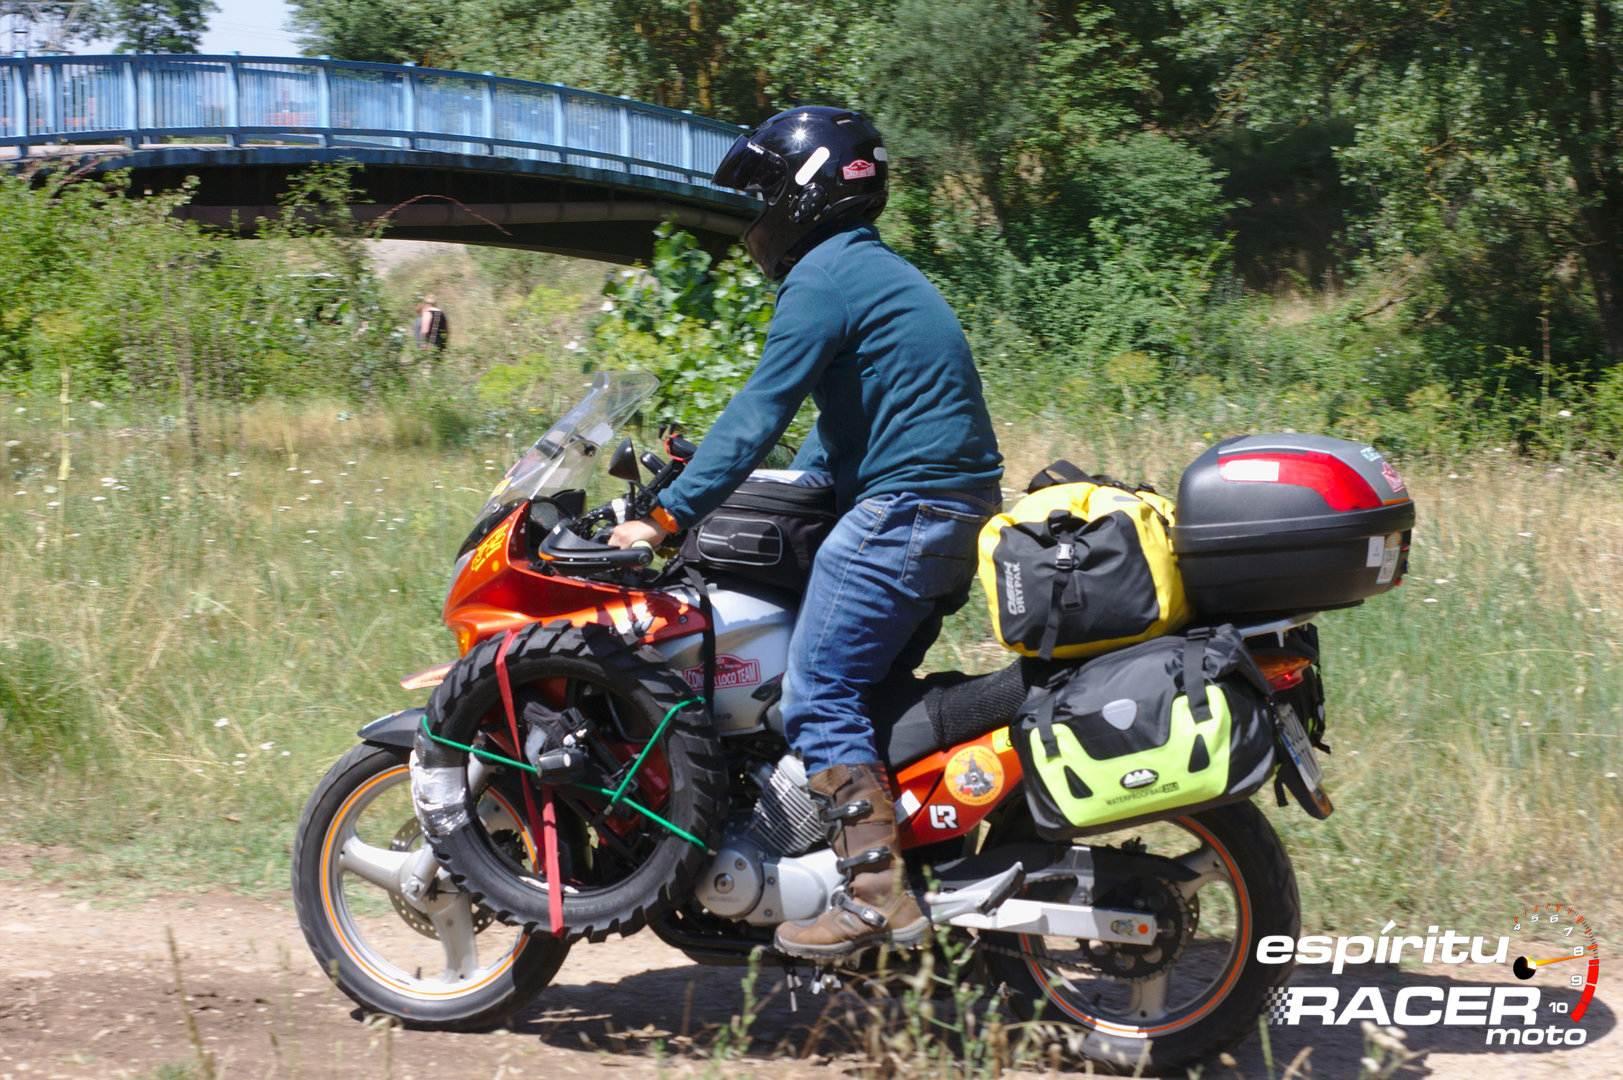 Pedro a Mongolia espirituRACER moto 02